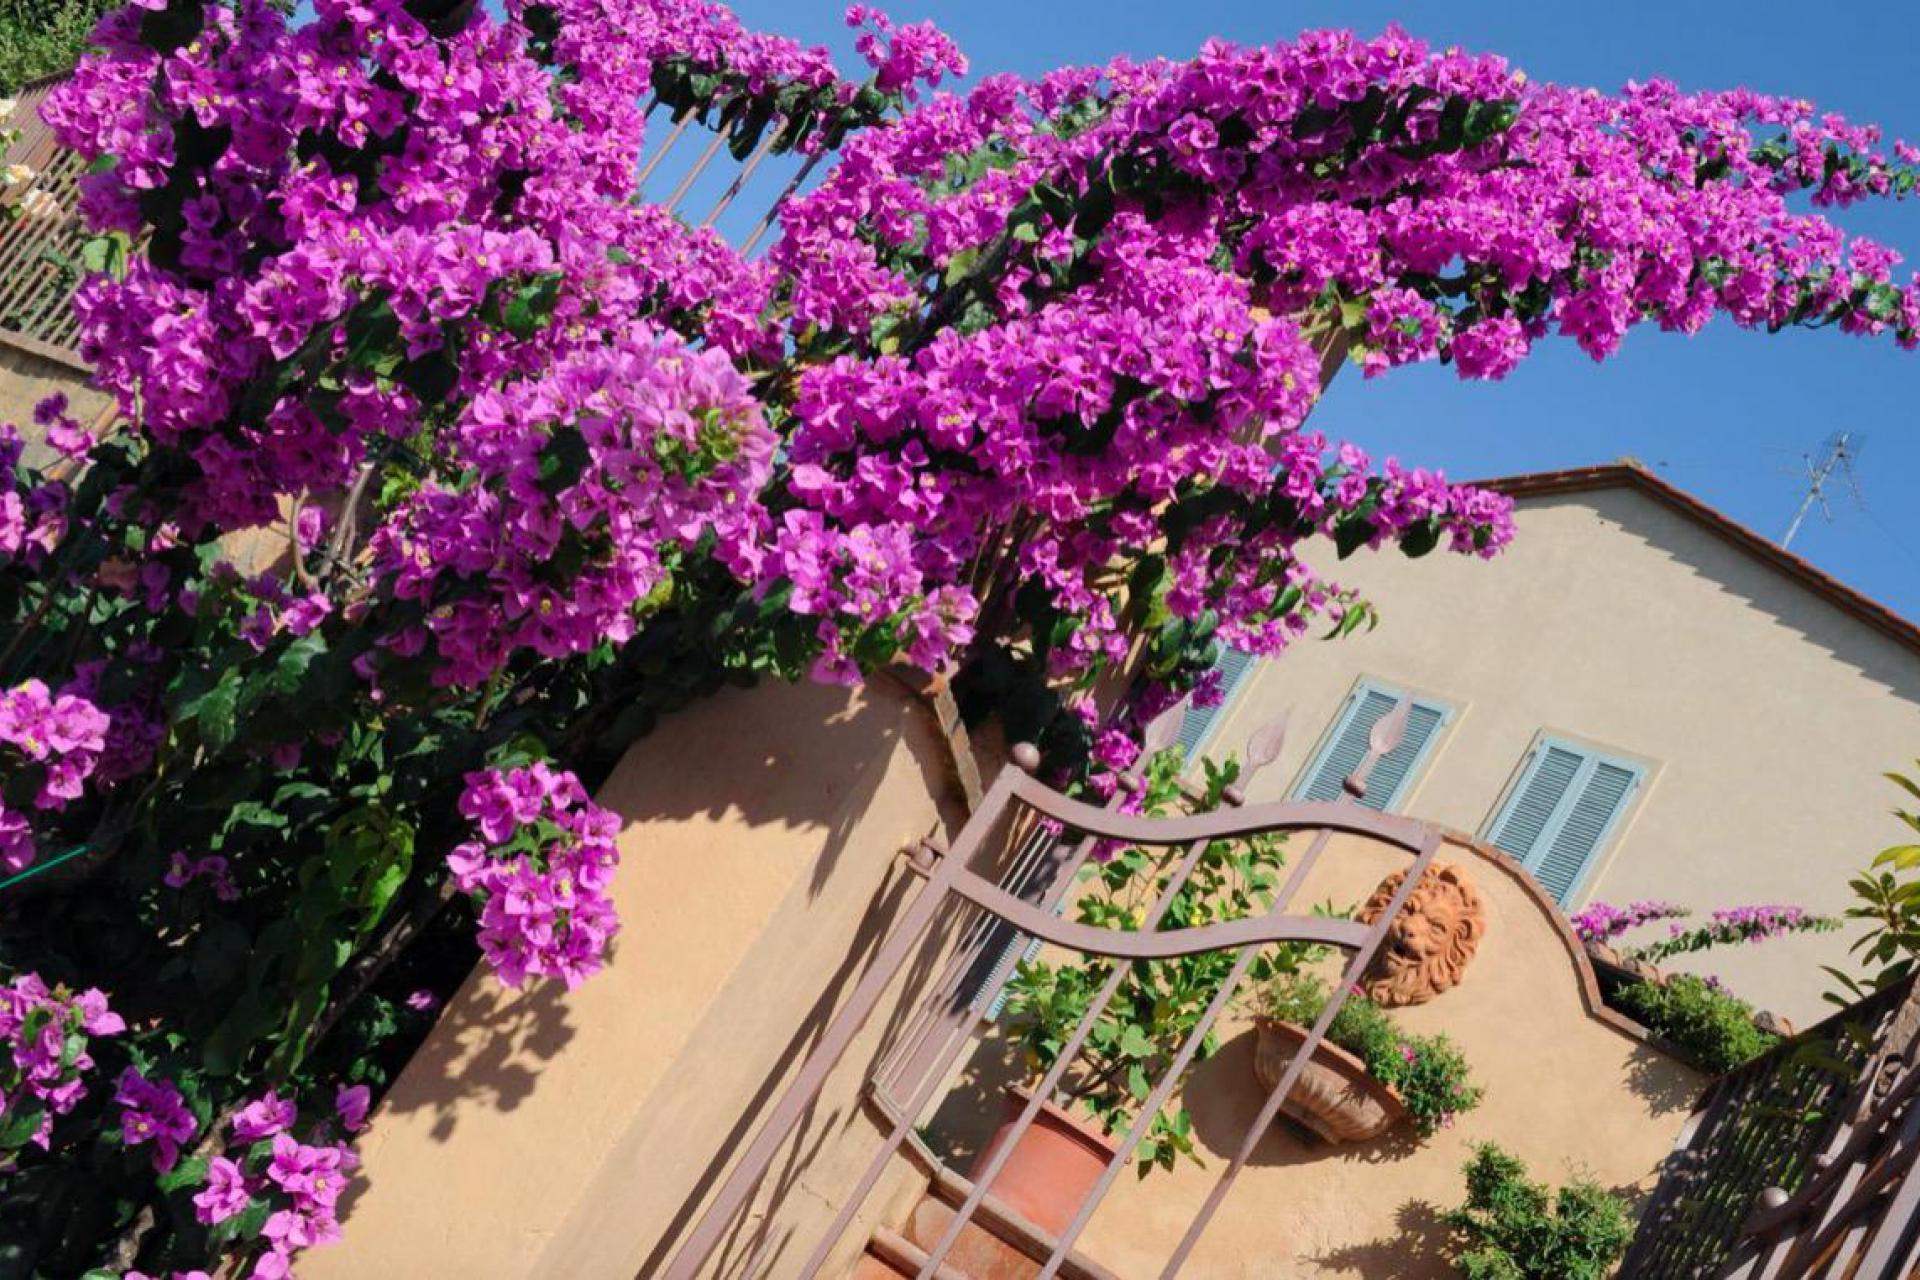 Agriturismo Toscane Luxe gemoedelijke agriturismo bij Volterra in Toscane